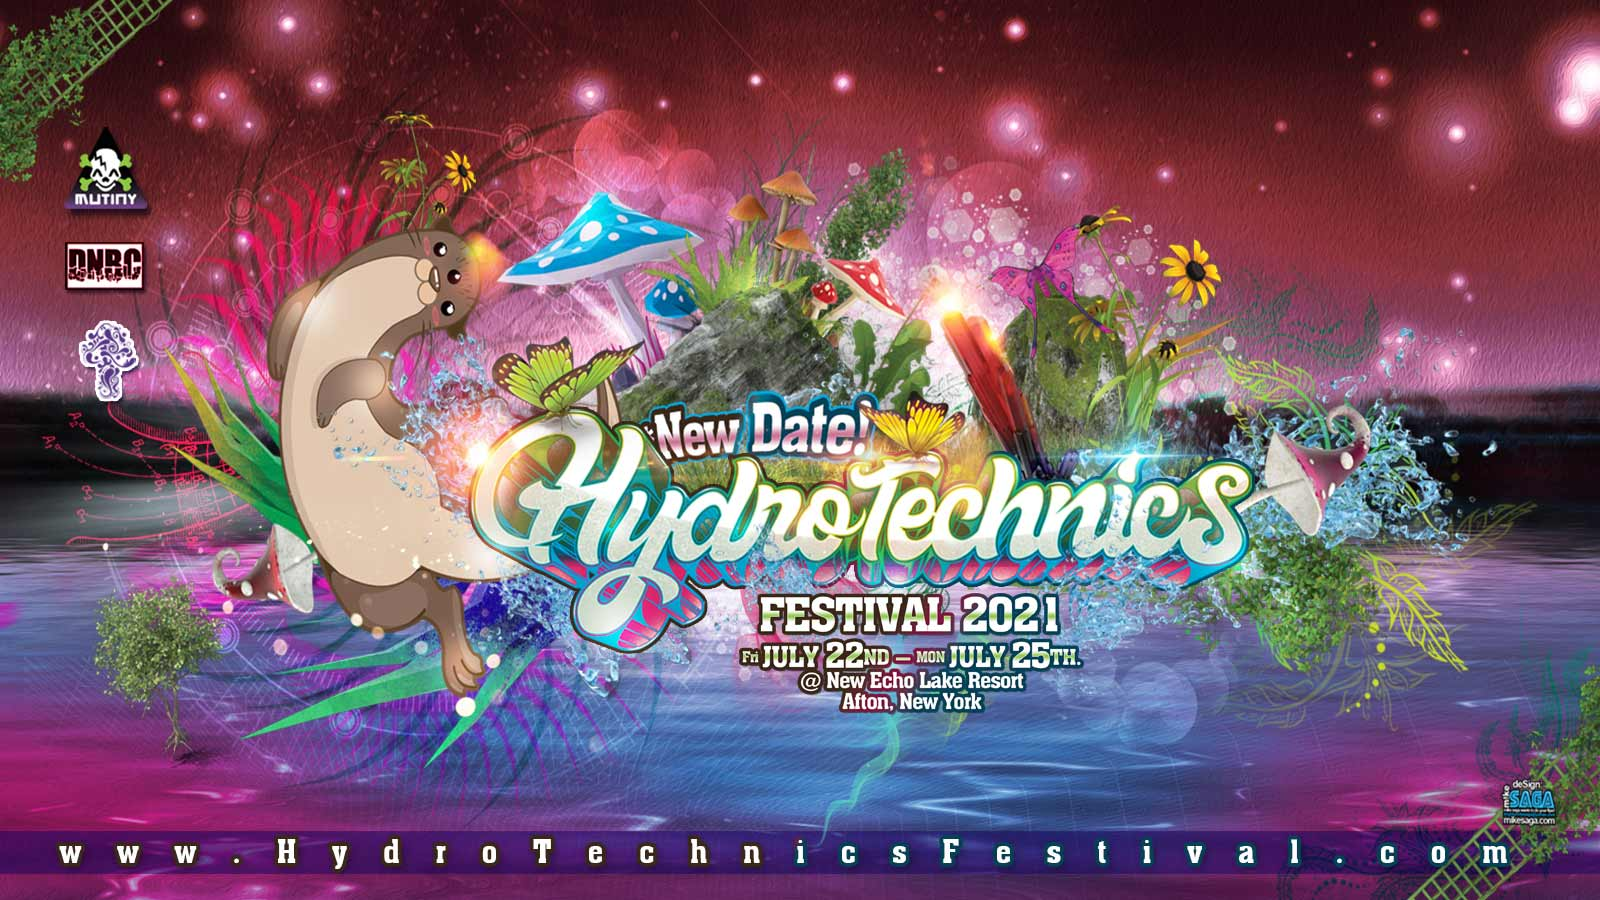 Hydrotechnics Festival - July 22nd-25th, 2021 - New Echo ...